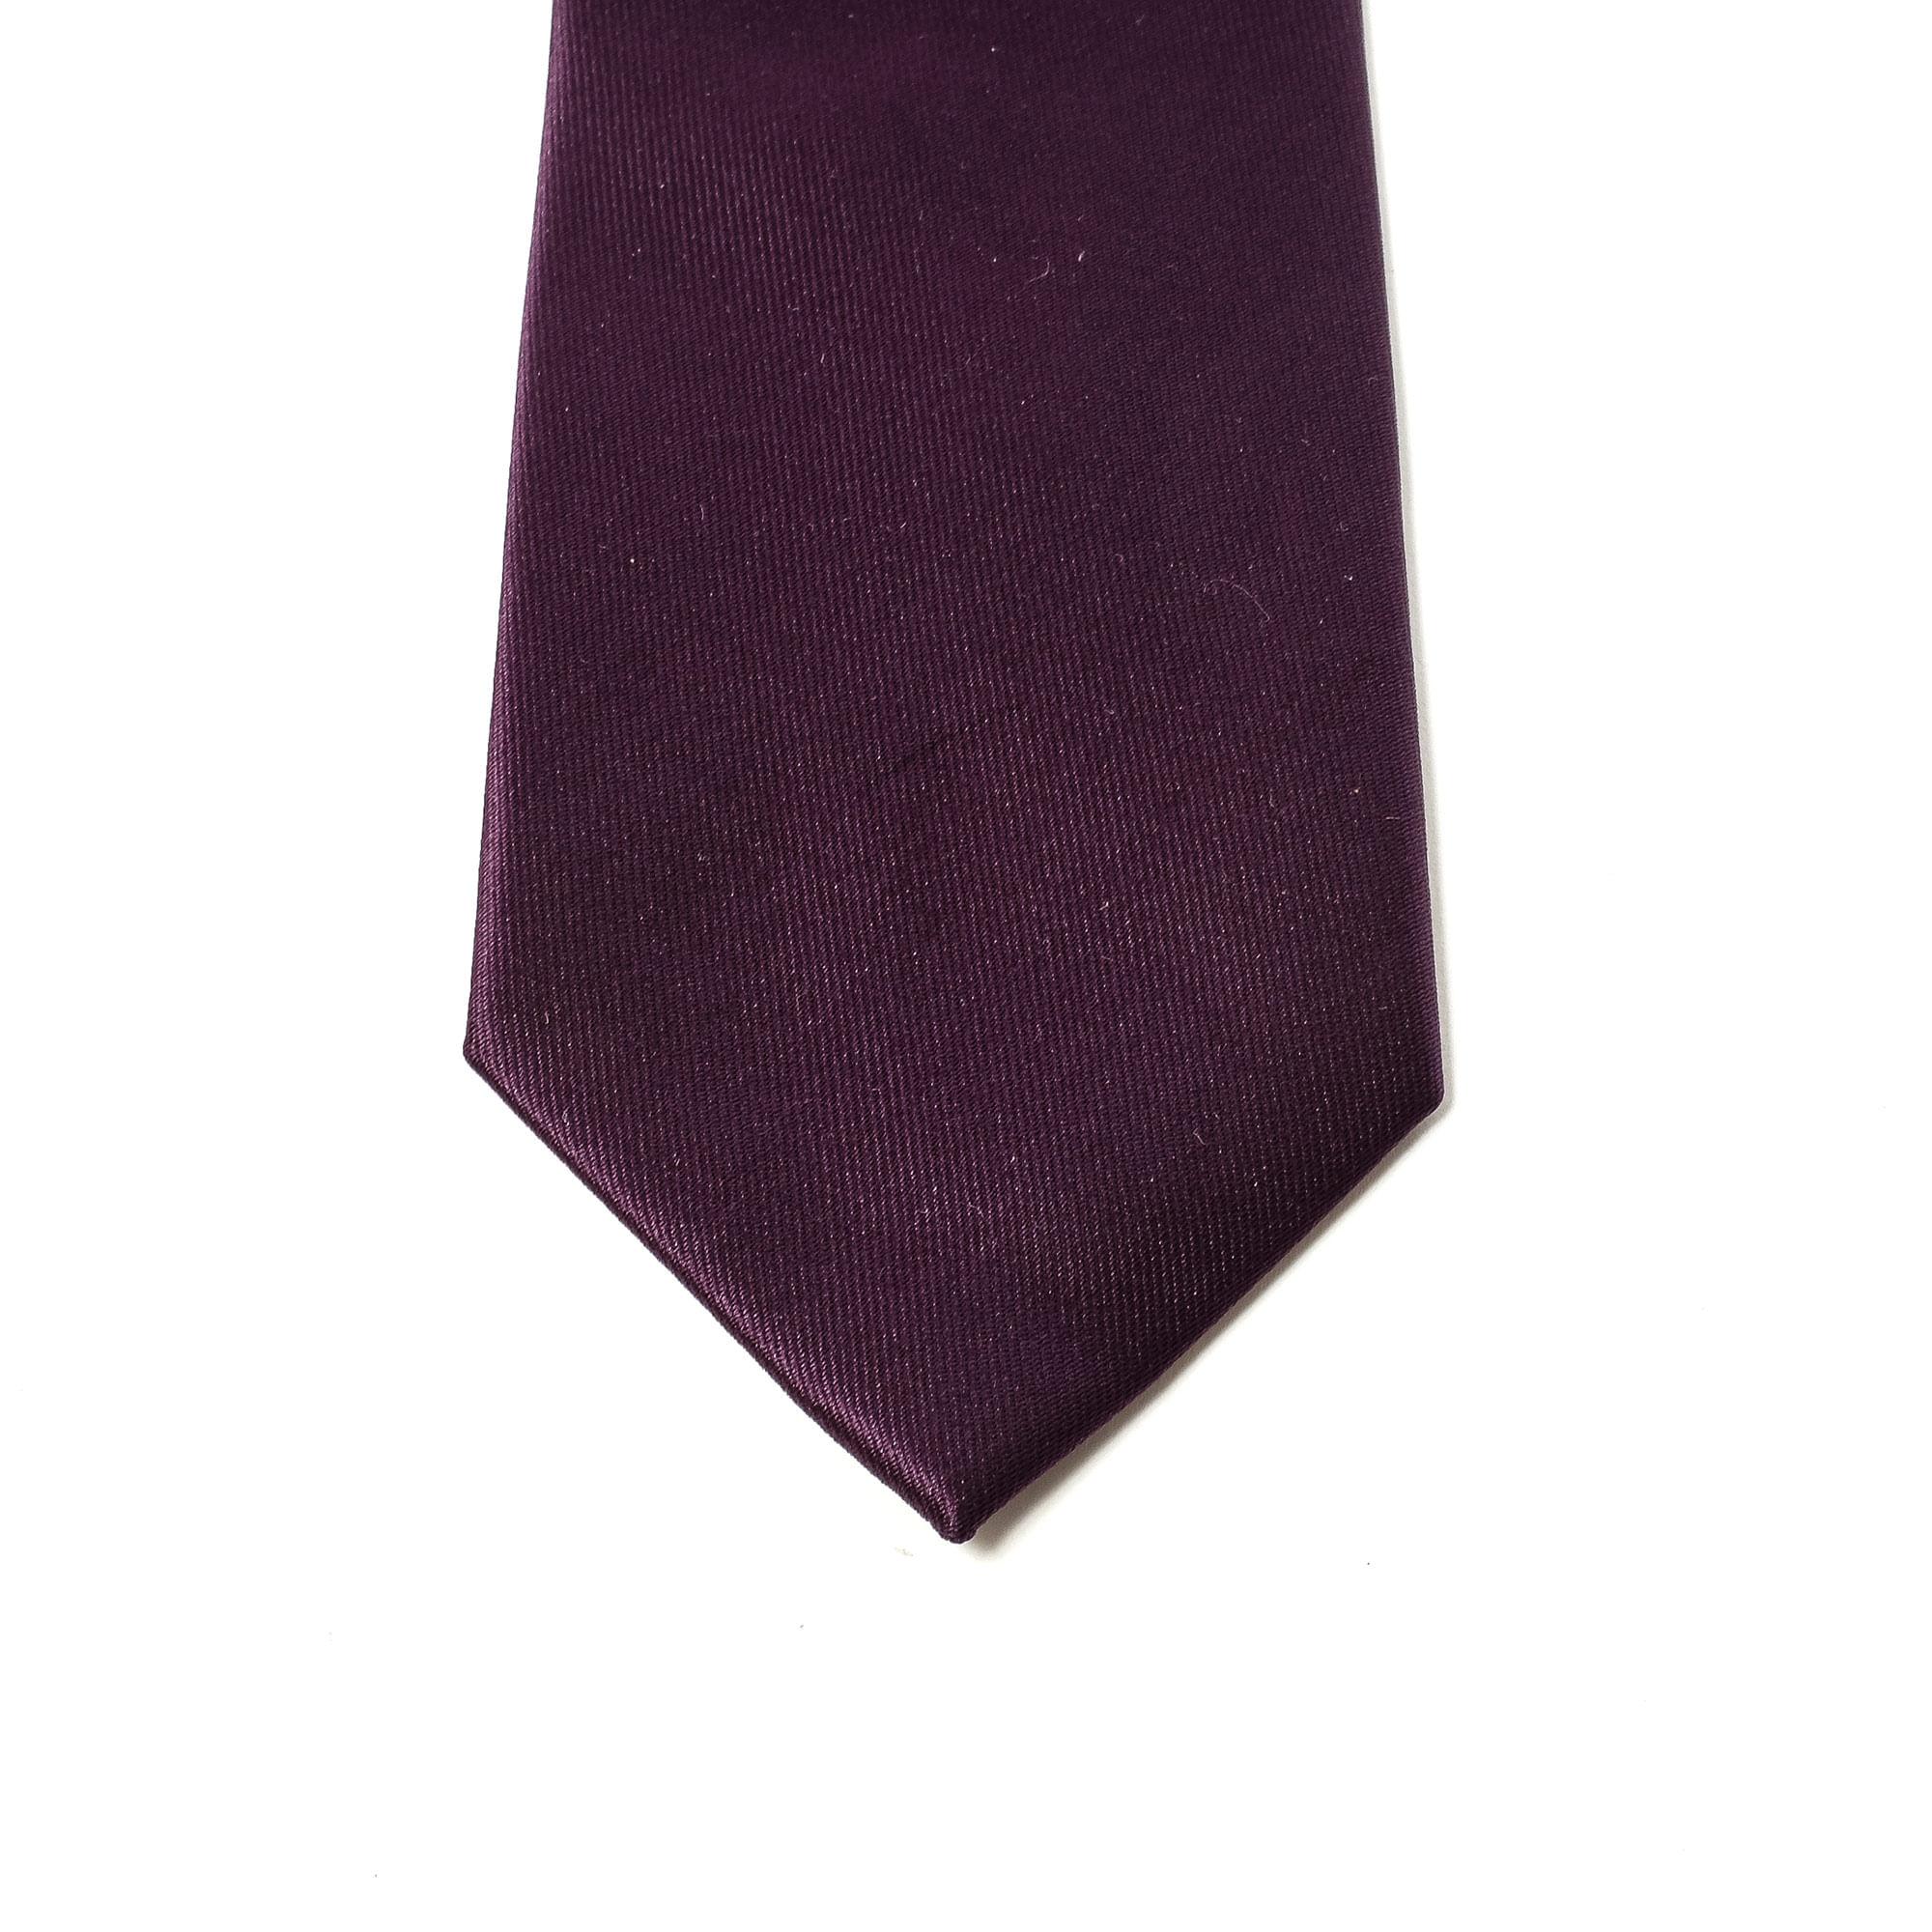 1b61aebac5 Gravata Masculina Slim Lisa - lojafattoamano